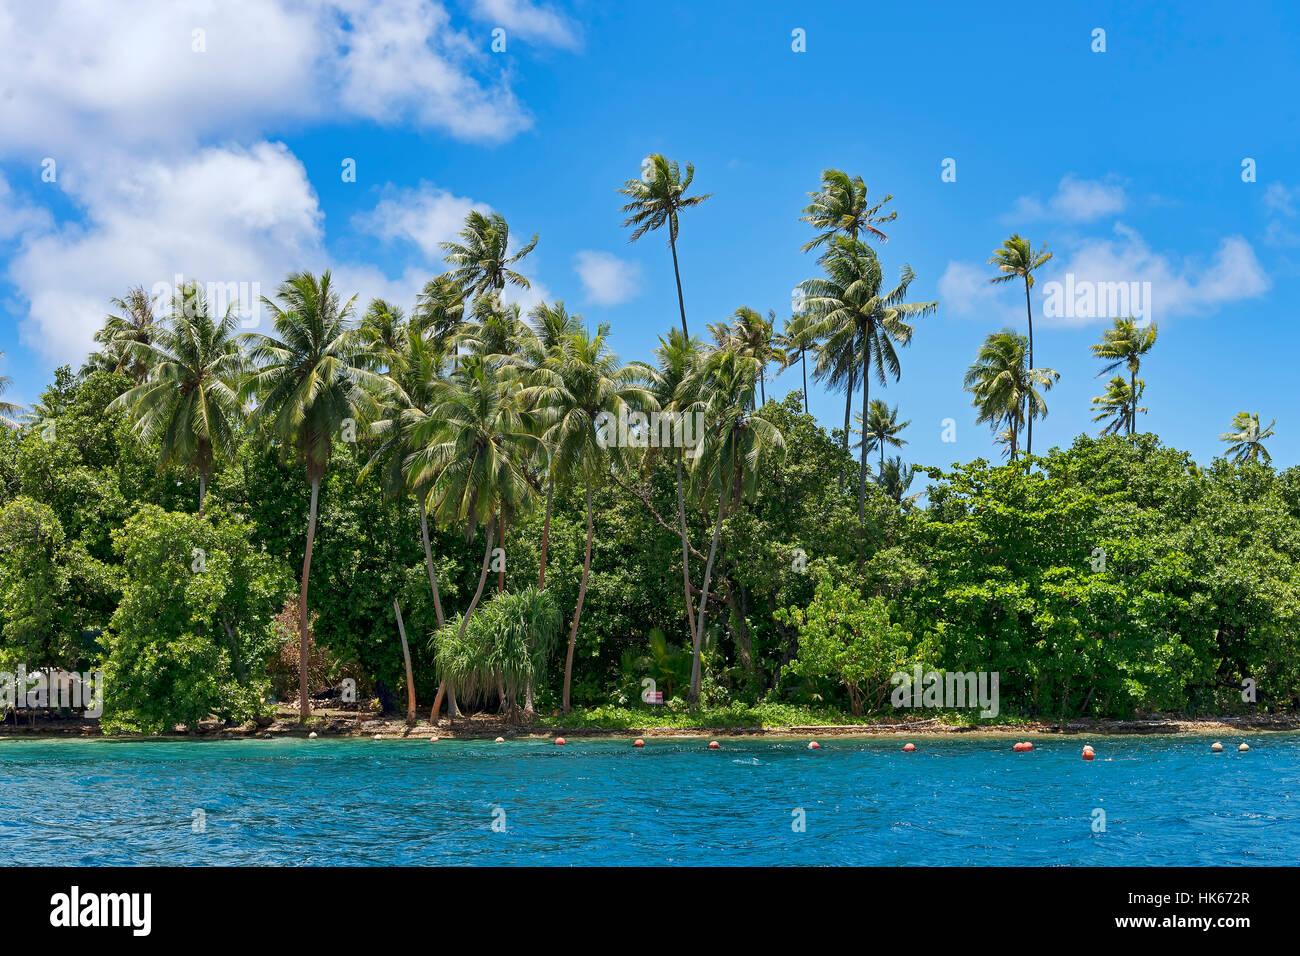 Palm Beach su Raiatea, Polinesia francese, South Pacific Oceania Immagini Stock